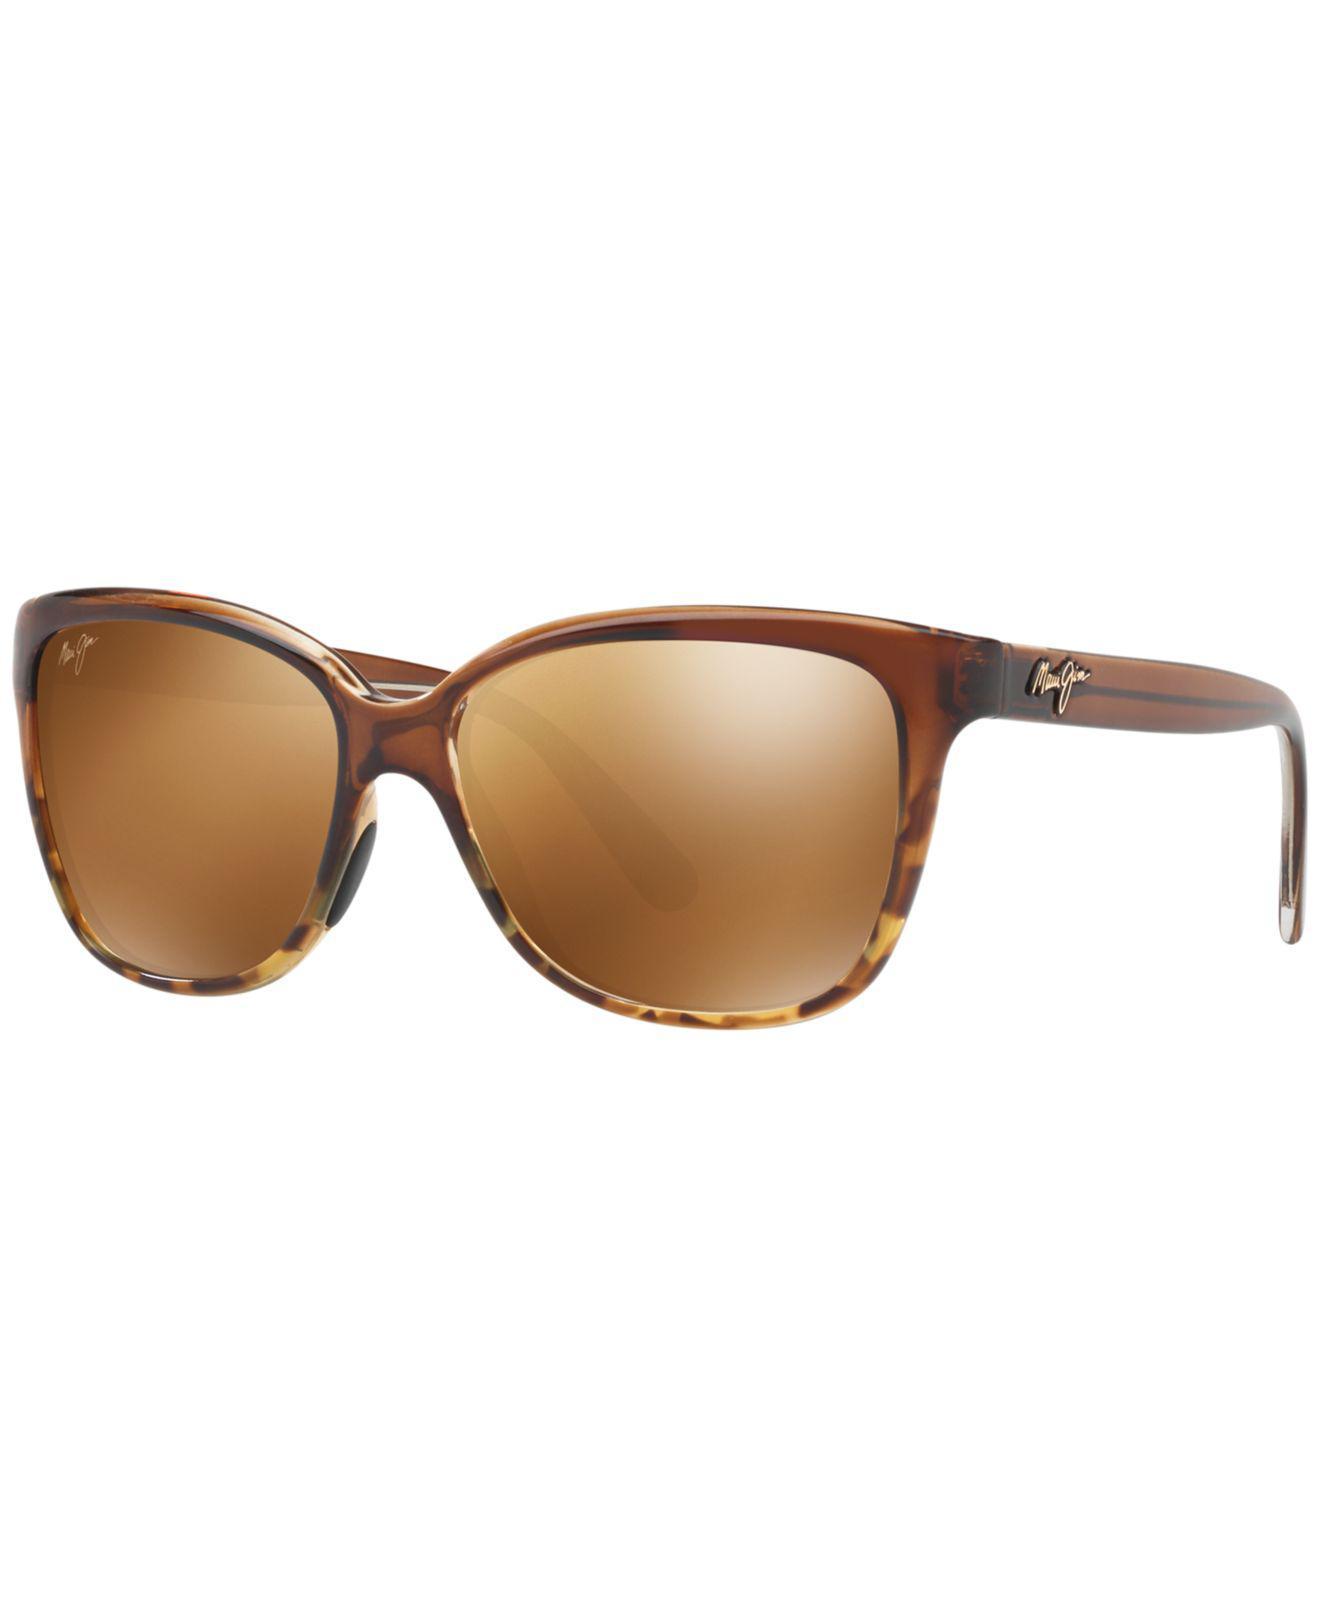 5a2c643e2348f Maui Jim. Women s Brown Starfish Sunglasses